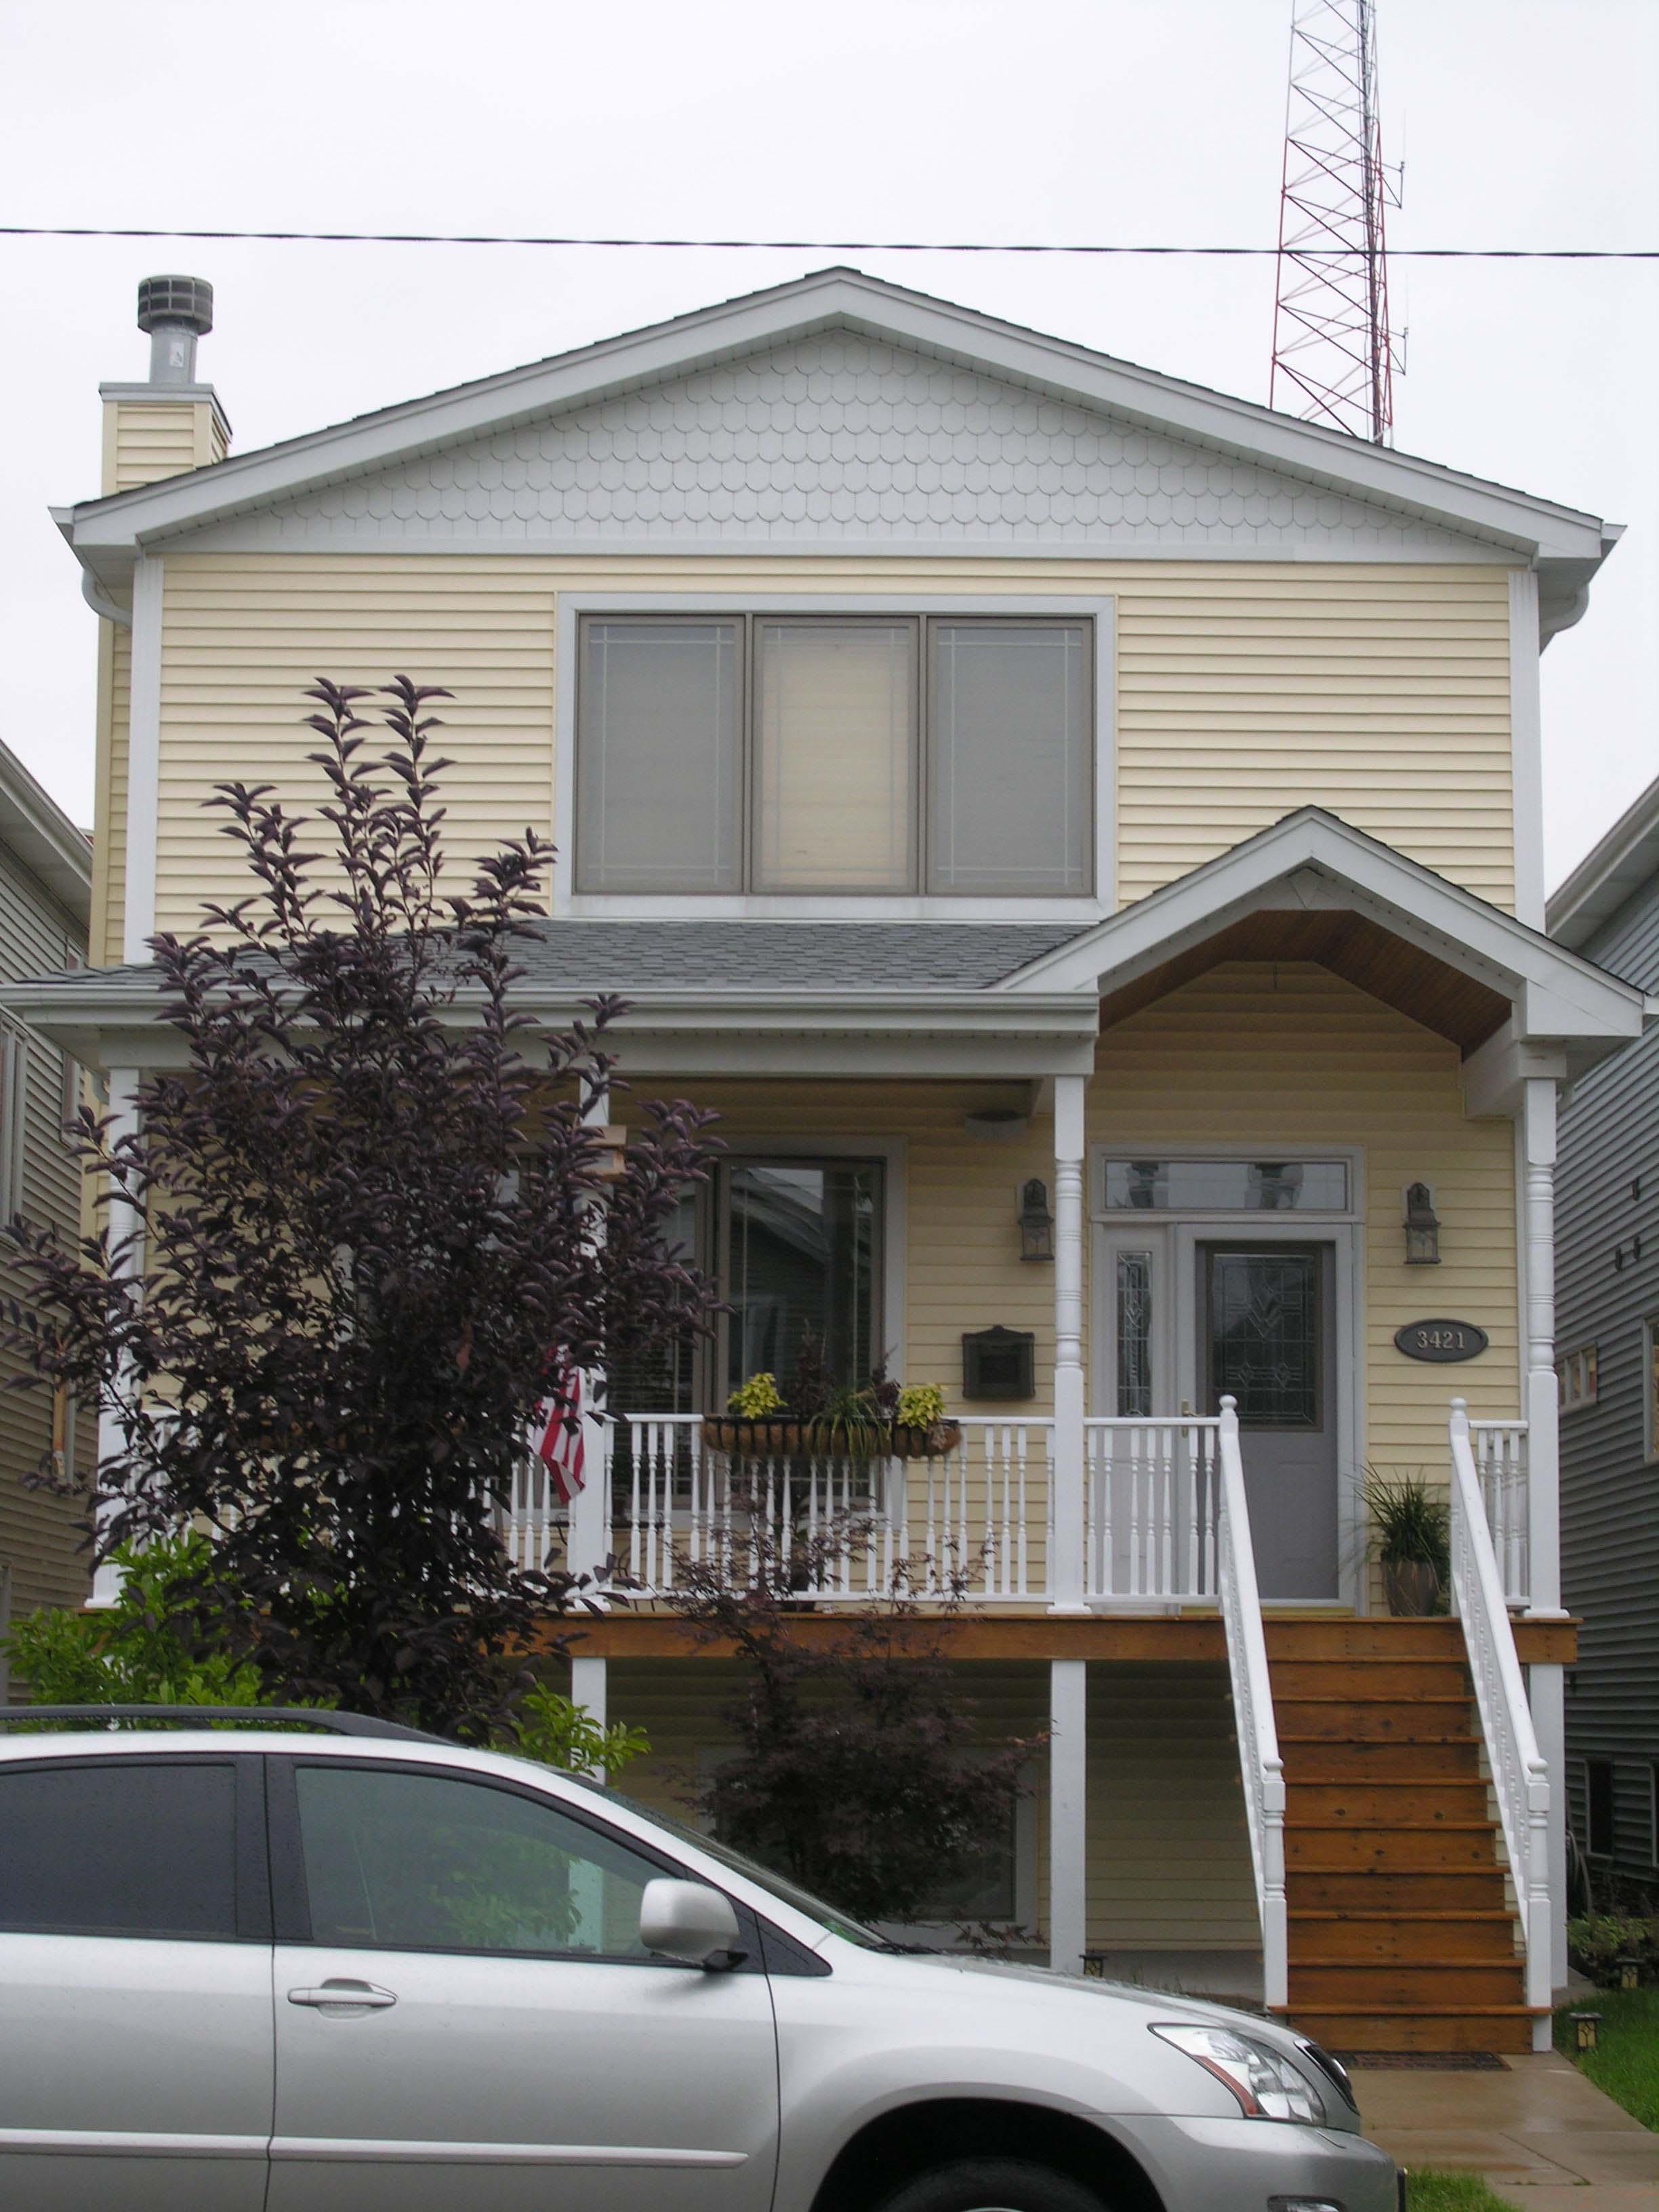 3400 block of North Albany